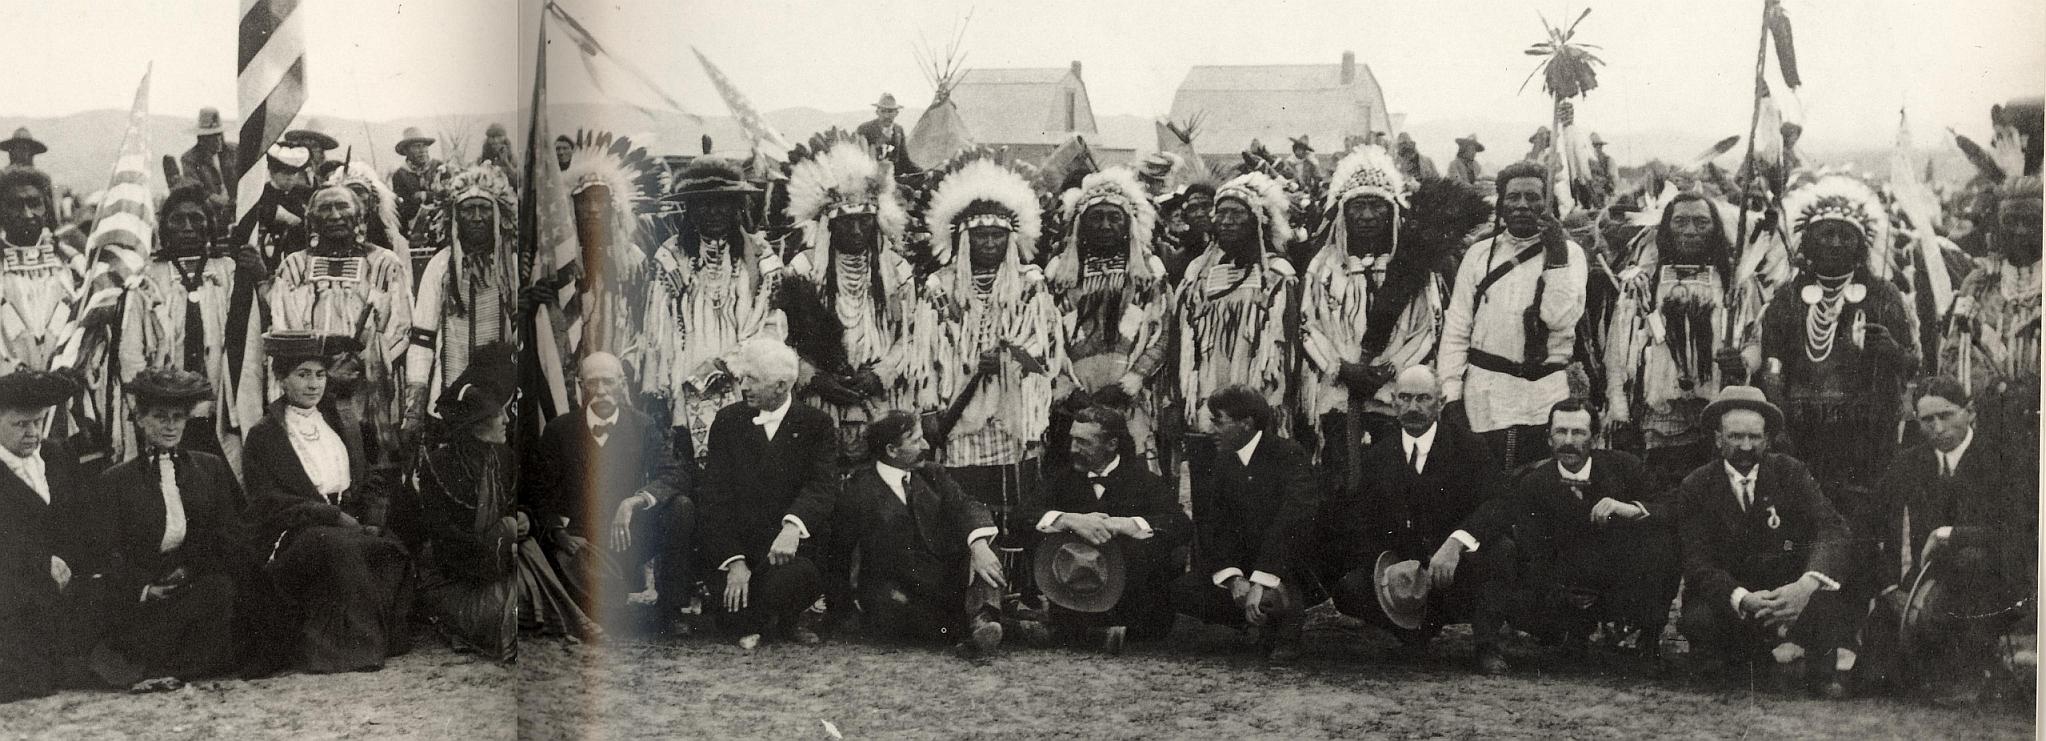 http://www.american-tribes.com/messageboards/dietmar/CrowChiefs1903.jpg